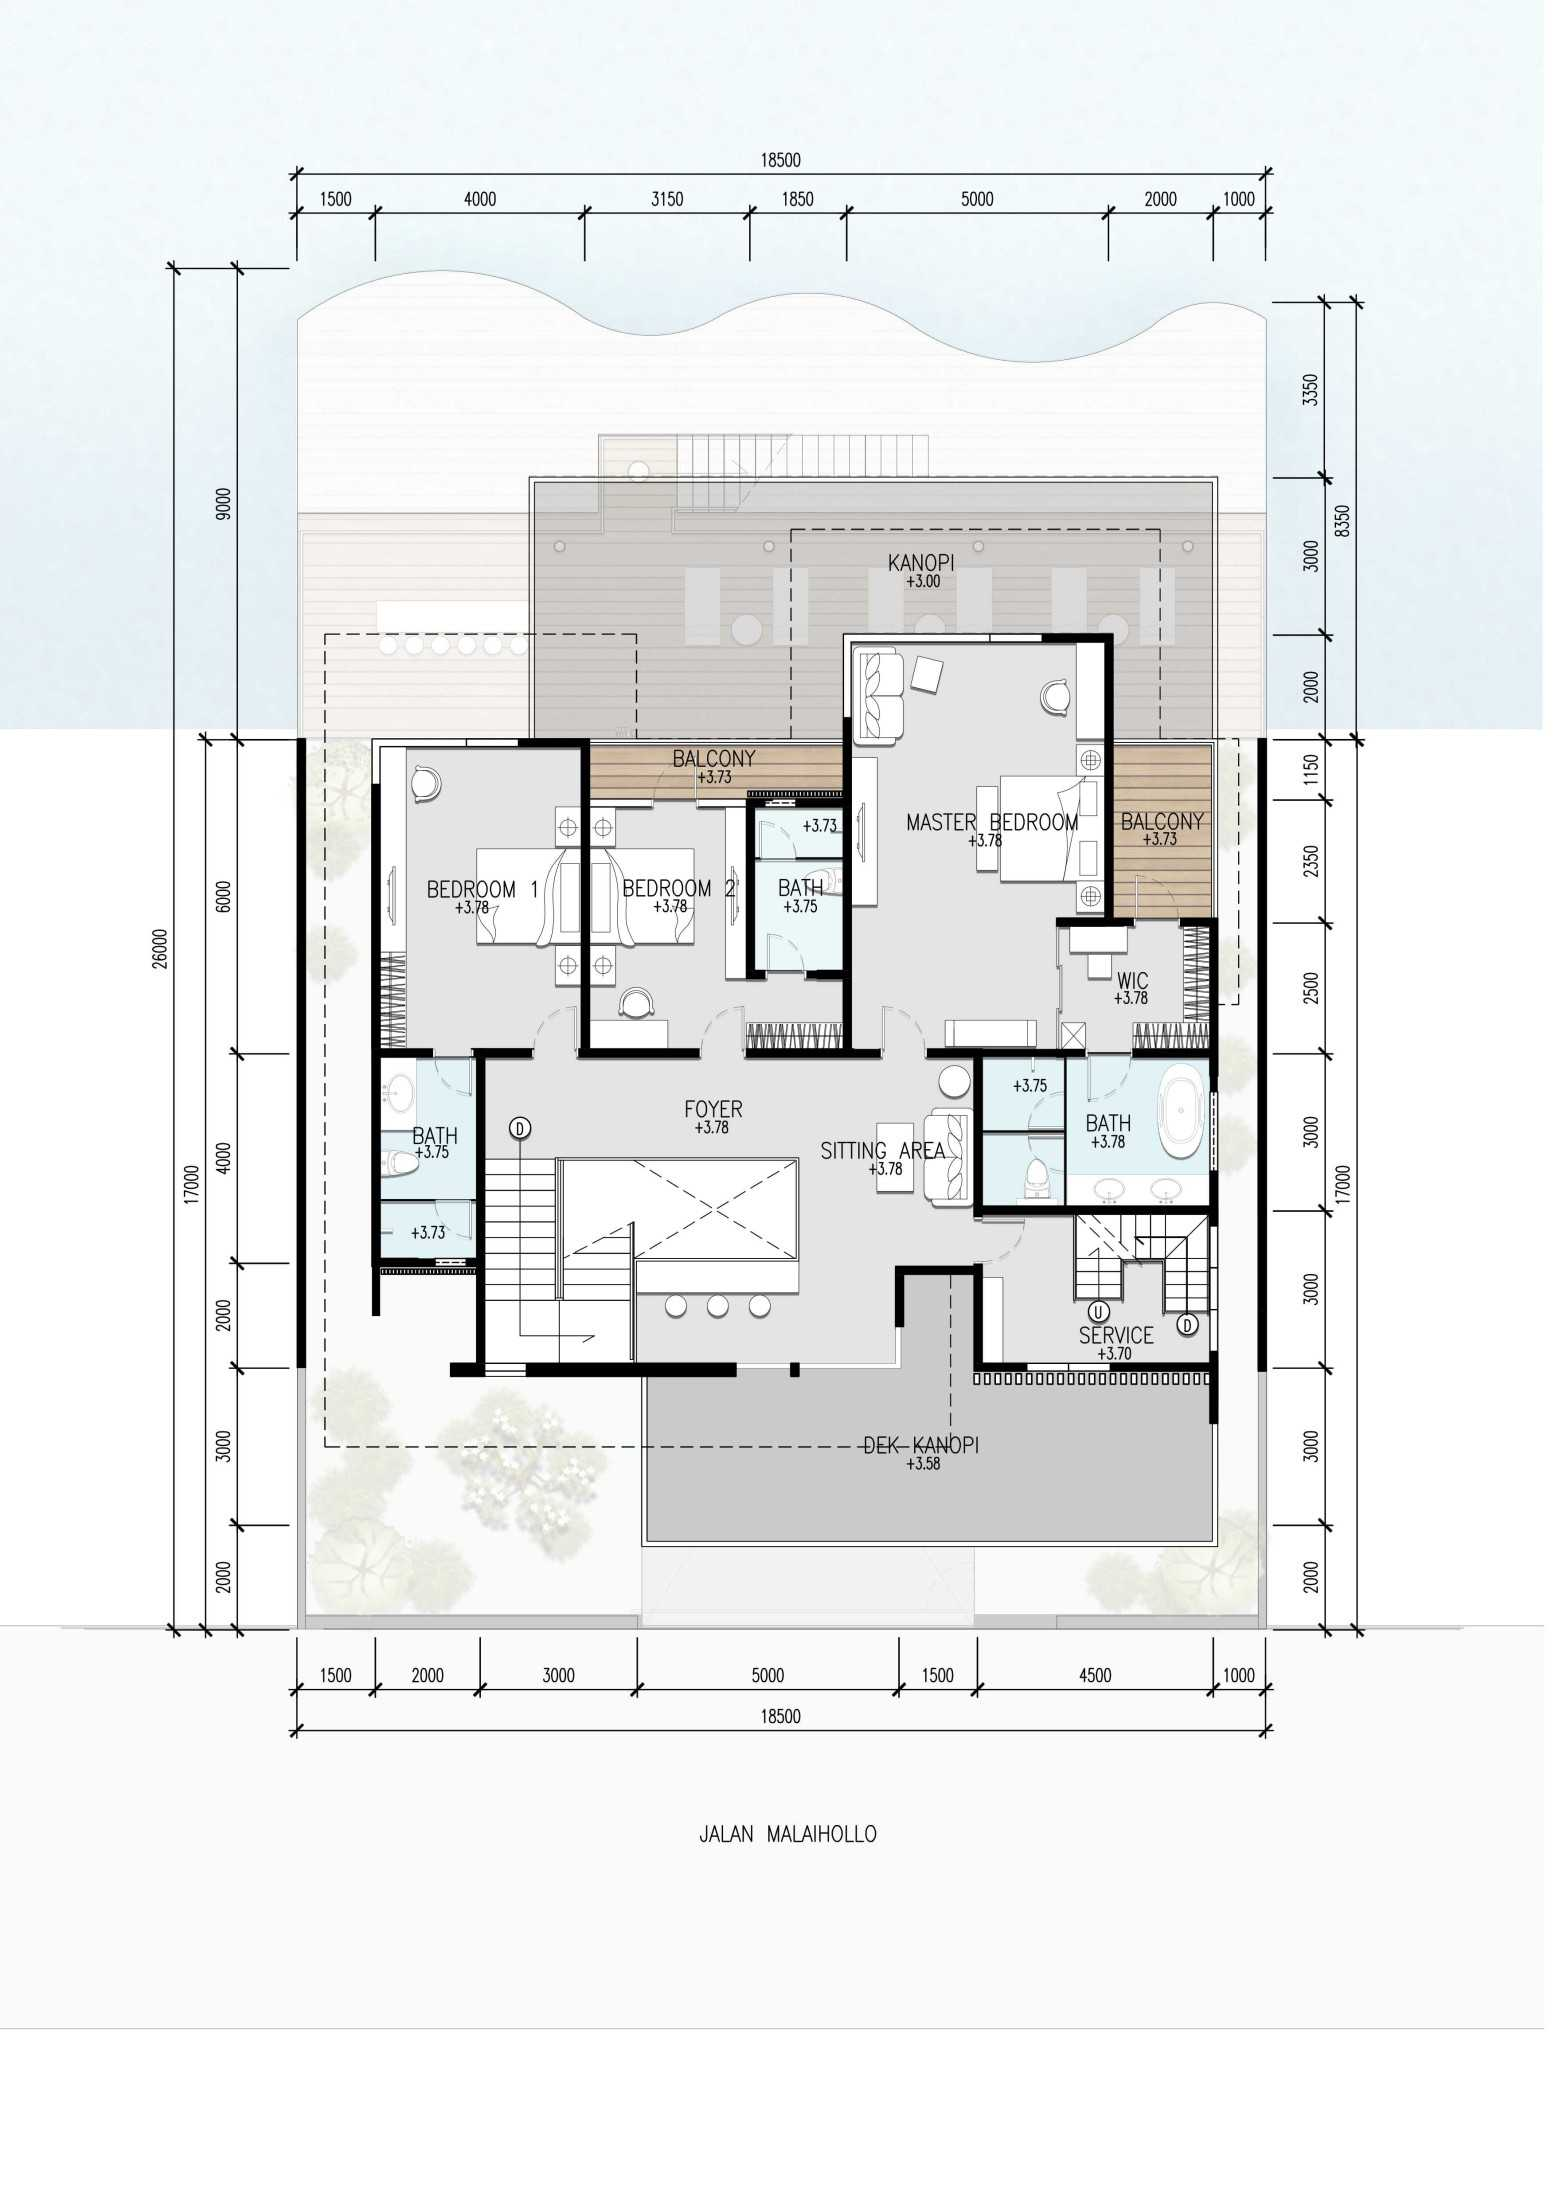 Baskara Design And Planning Malaiholo Residence Pulau Ambon, Maluku, Indonesia Pulau Ambon, Maluku, Indonesia Baskara-Design-And-Planning-Malaiholo-Residence  67074